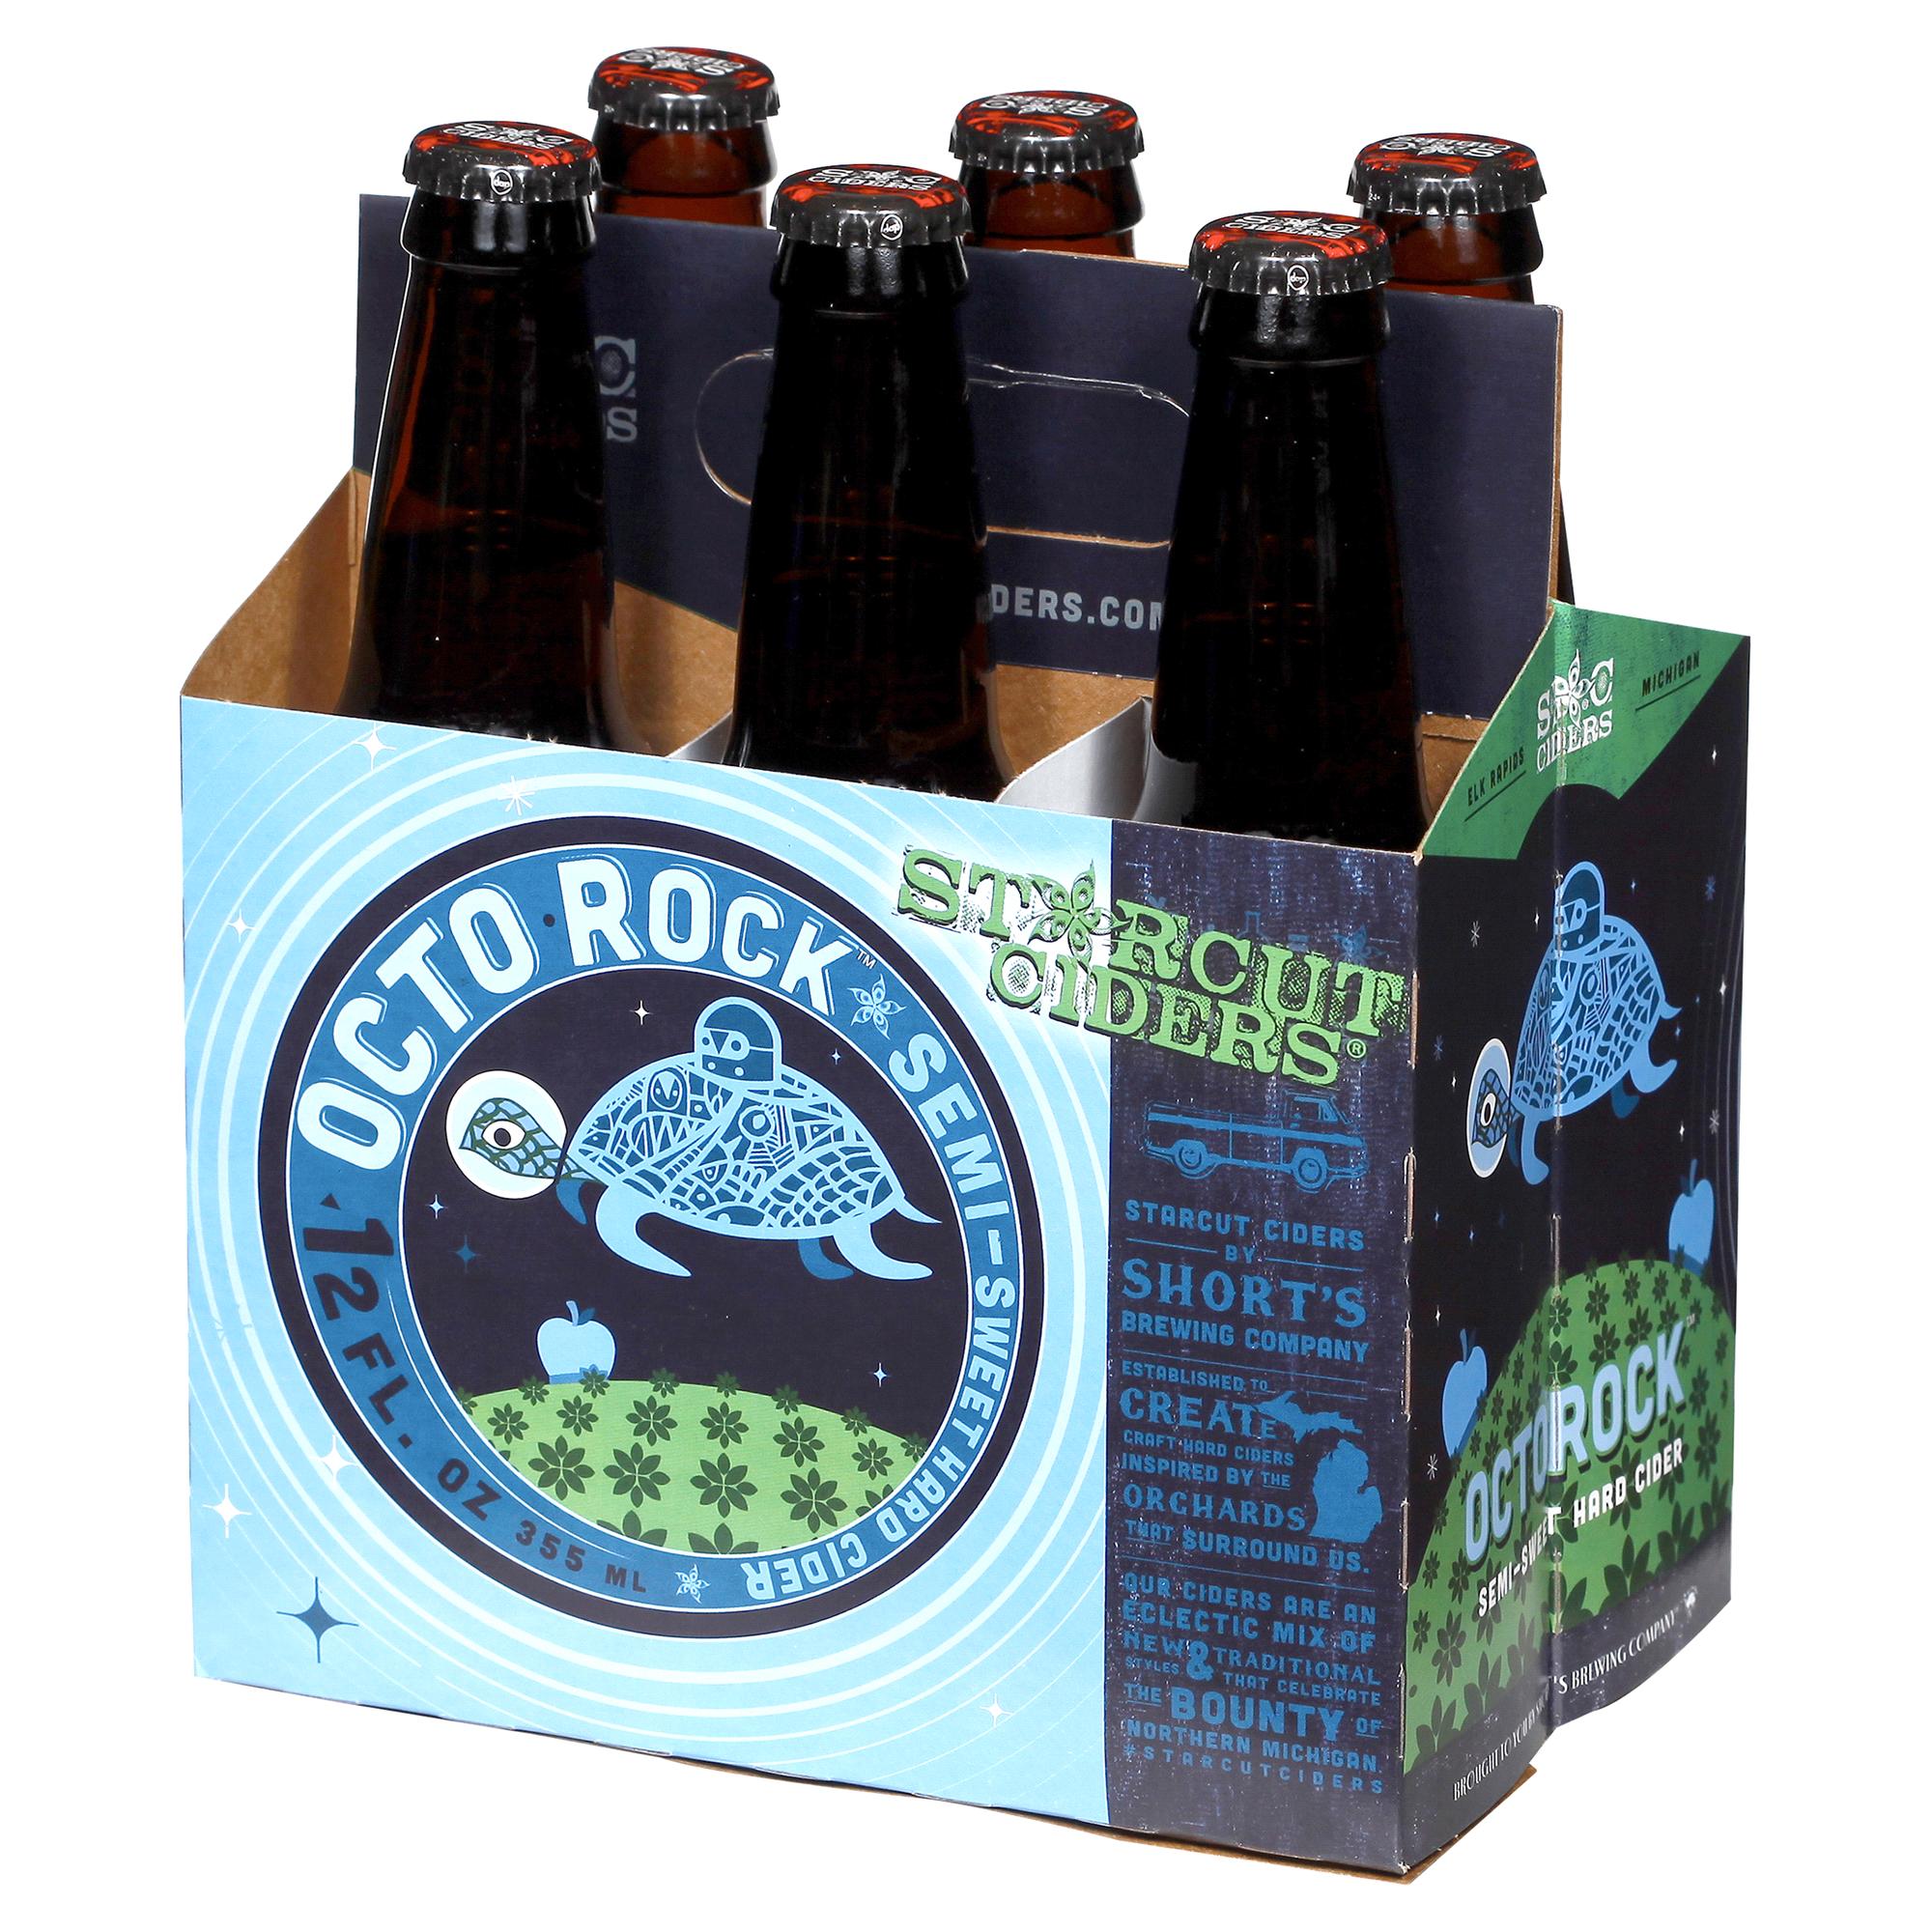 Starcut Cider Octorock 6 pk 12 oz Bottle